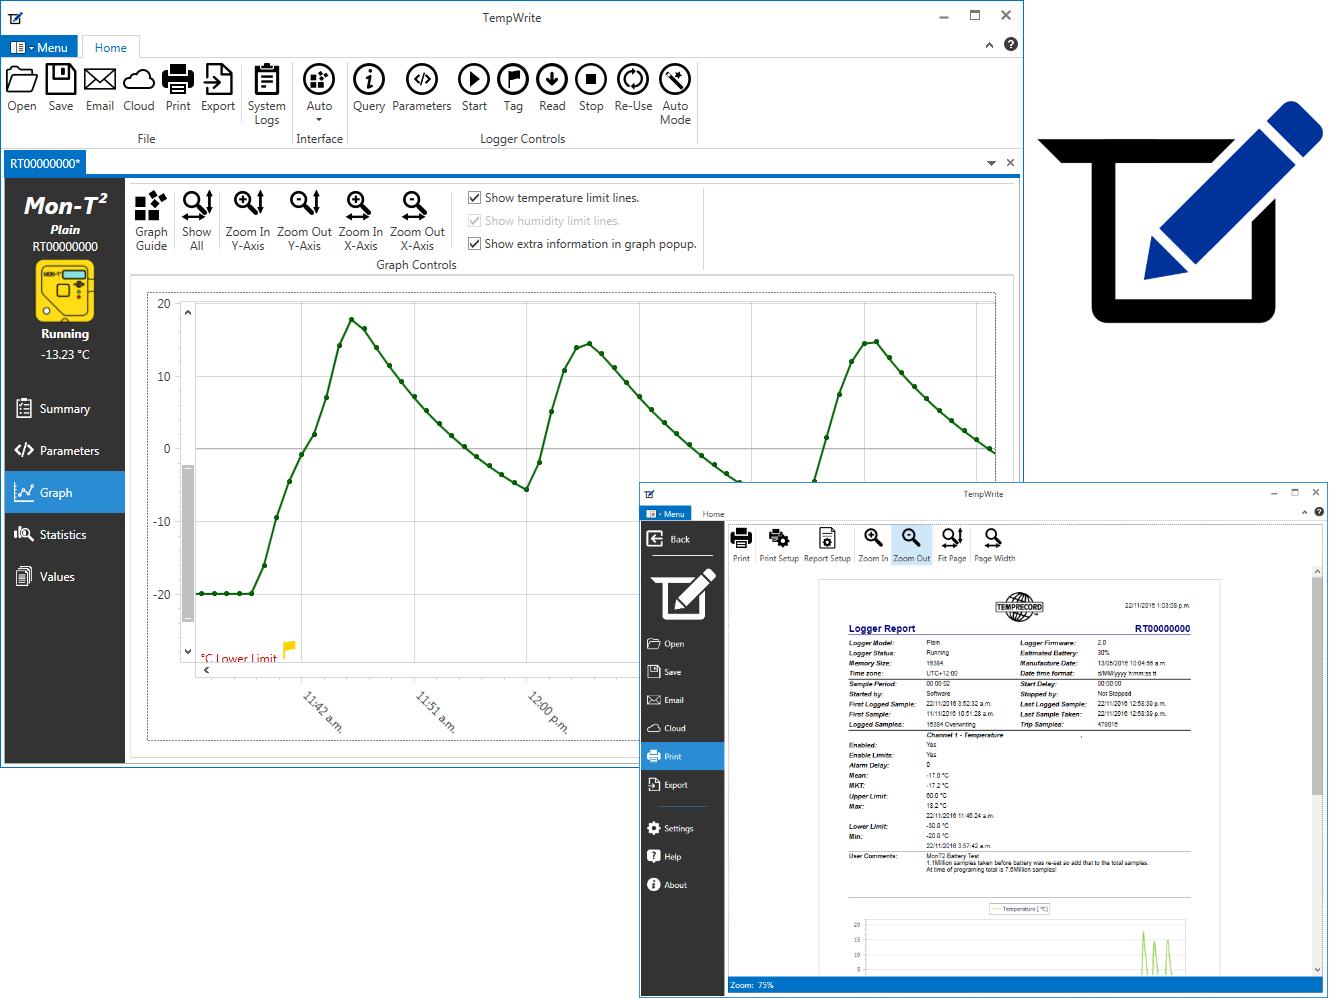 TempWrite screenshots.